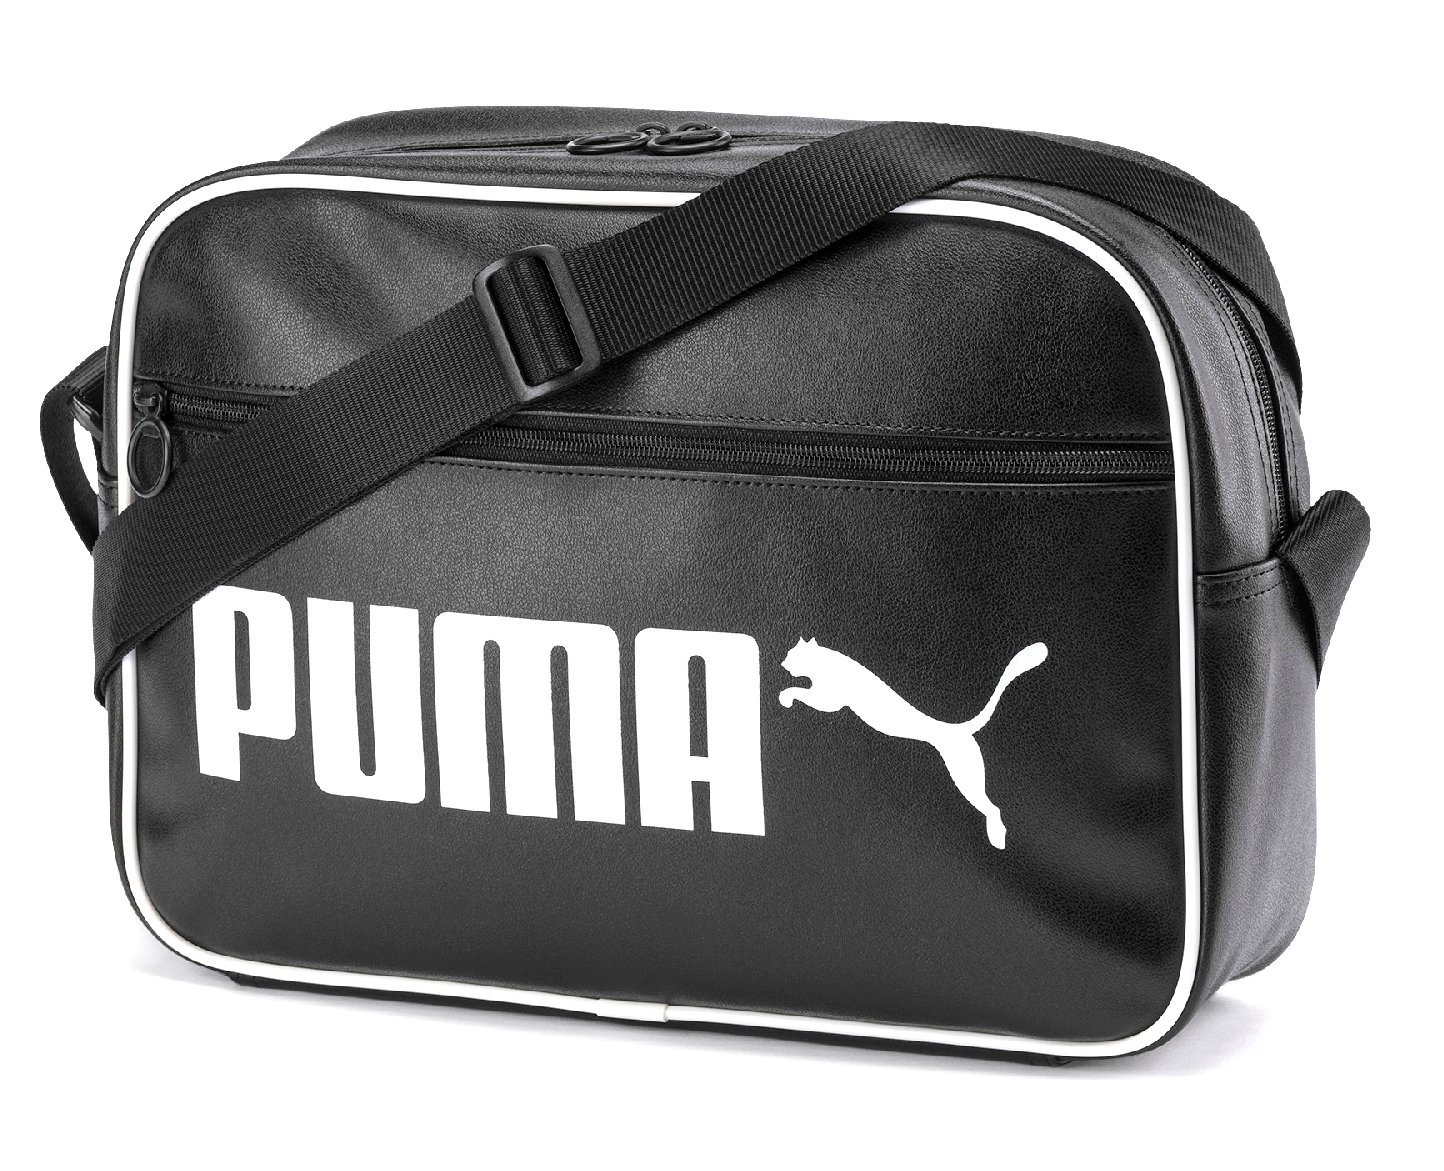 puma messenger bags off 78% - bonyadroudaki.com